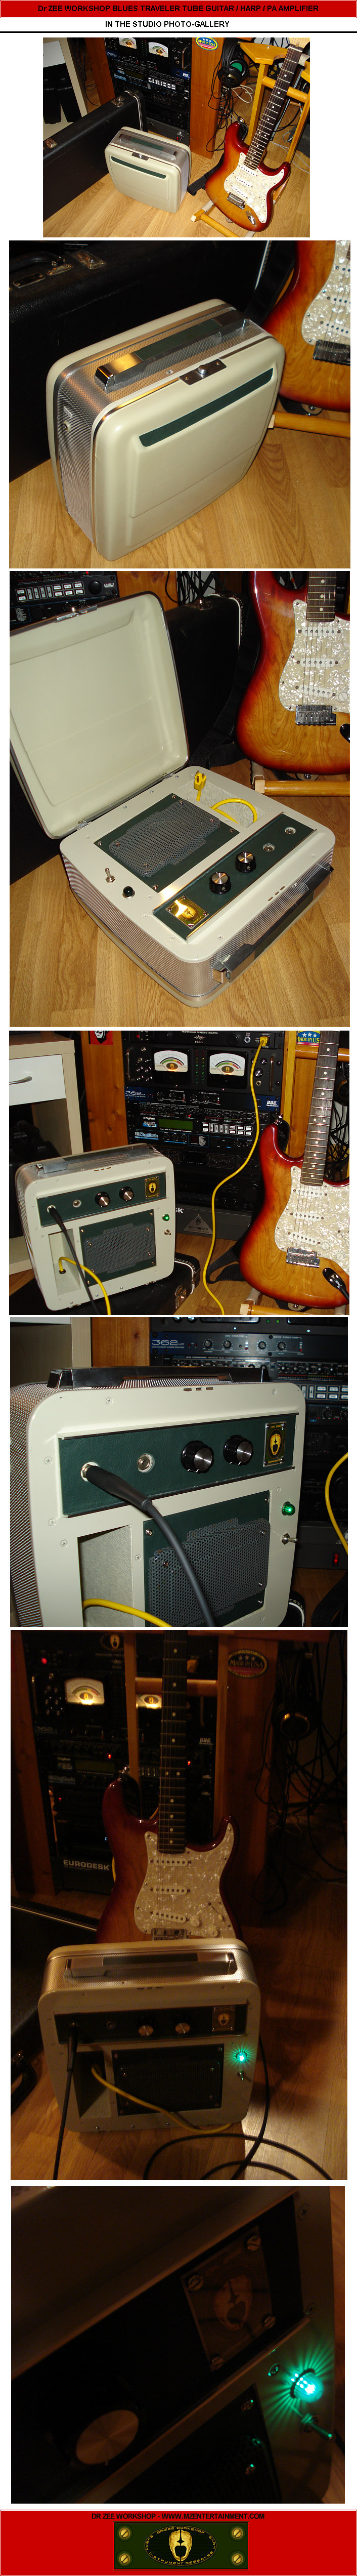 mze electroarts entertainment mzentertainment com dr zeeblues traveler guitar amp [in the studio photo gallery]